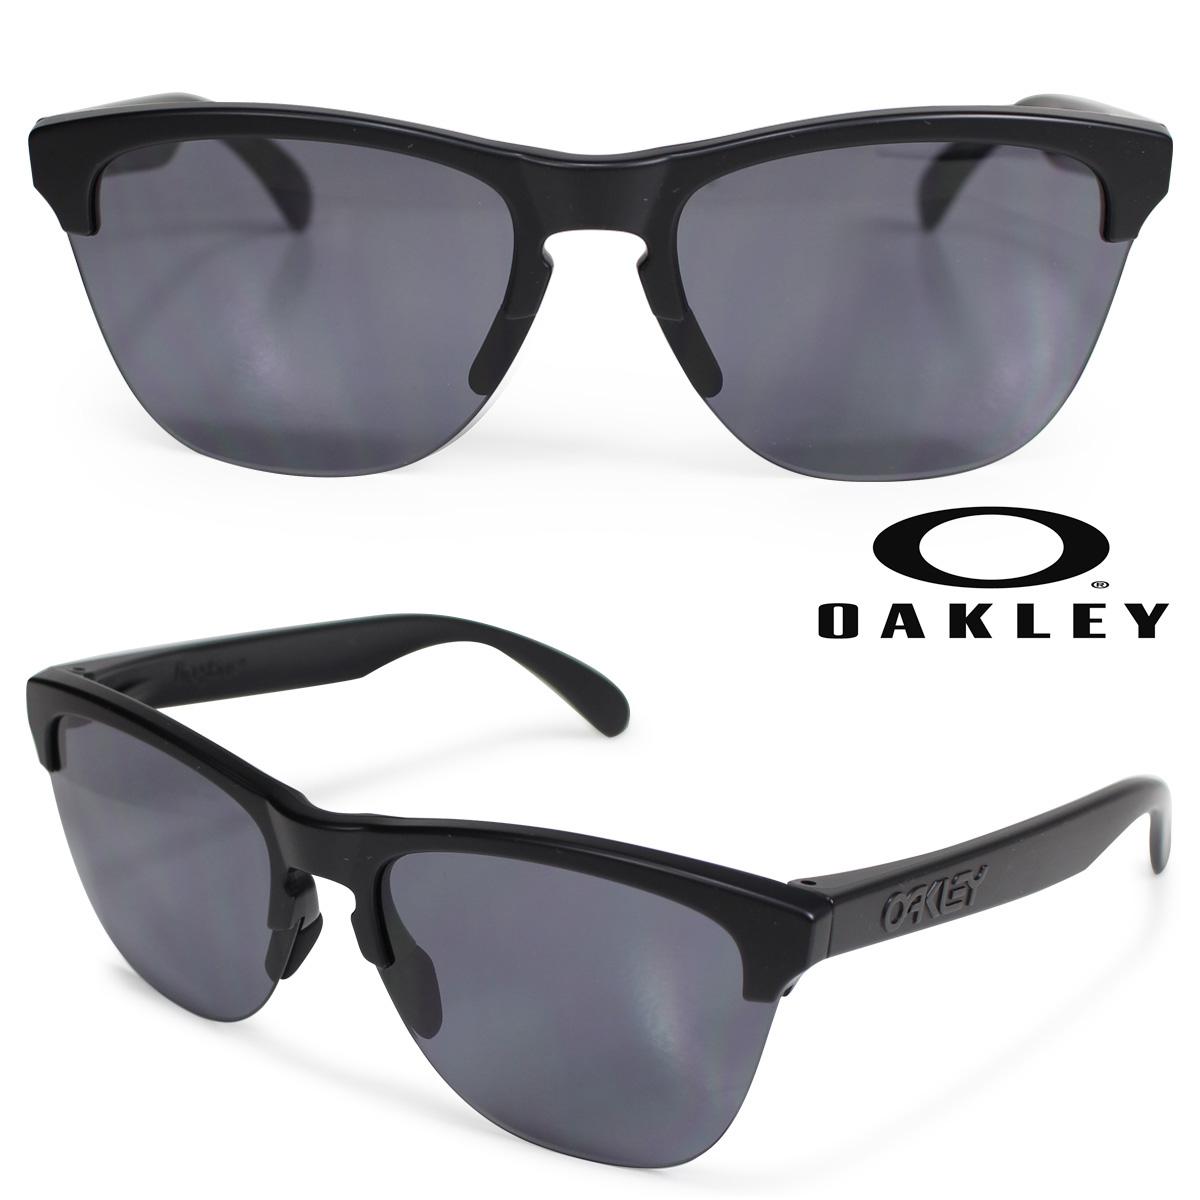 Oakley Frogskins lite オークリー サングラス フロッグスキン ライト US FIT メンズ レディース ブラック OO9374-01